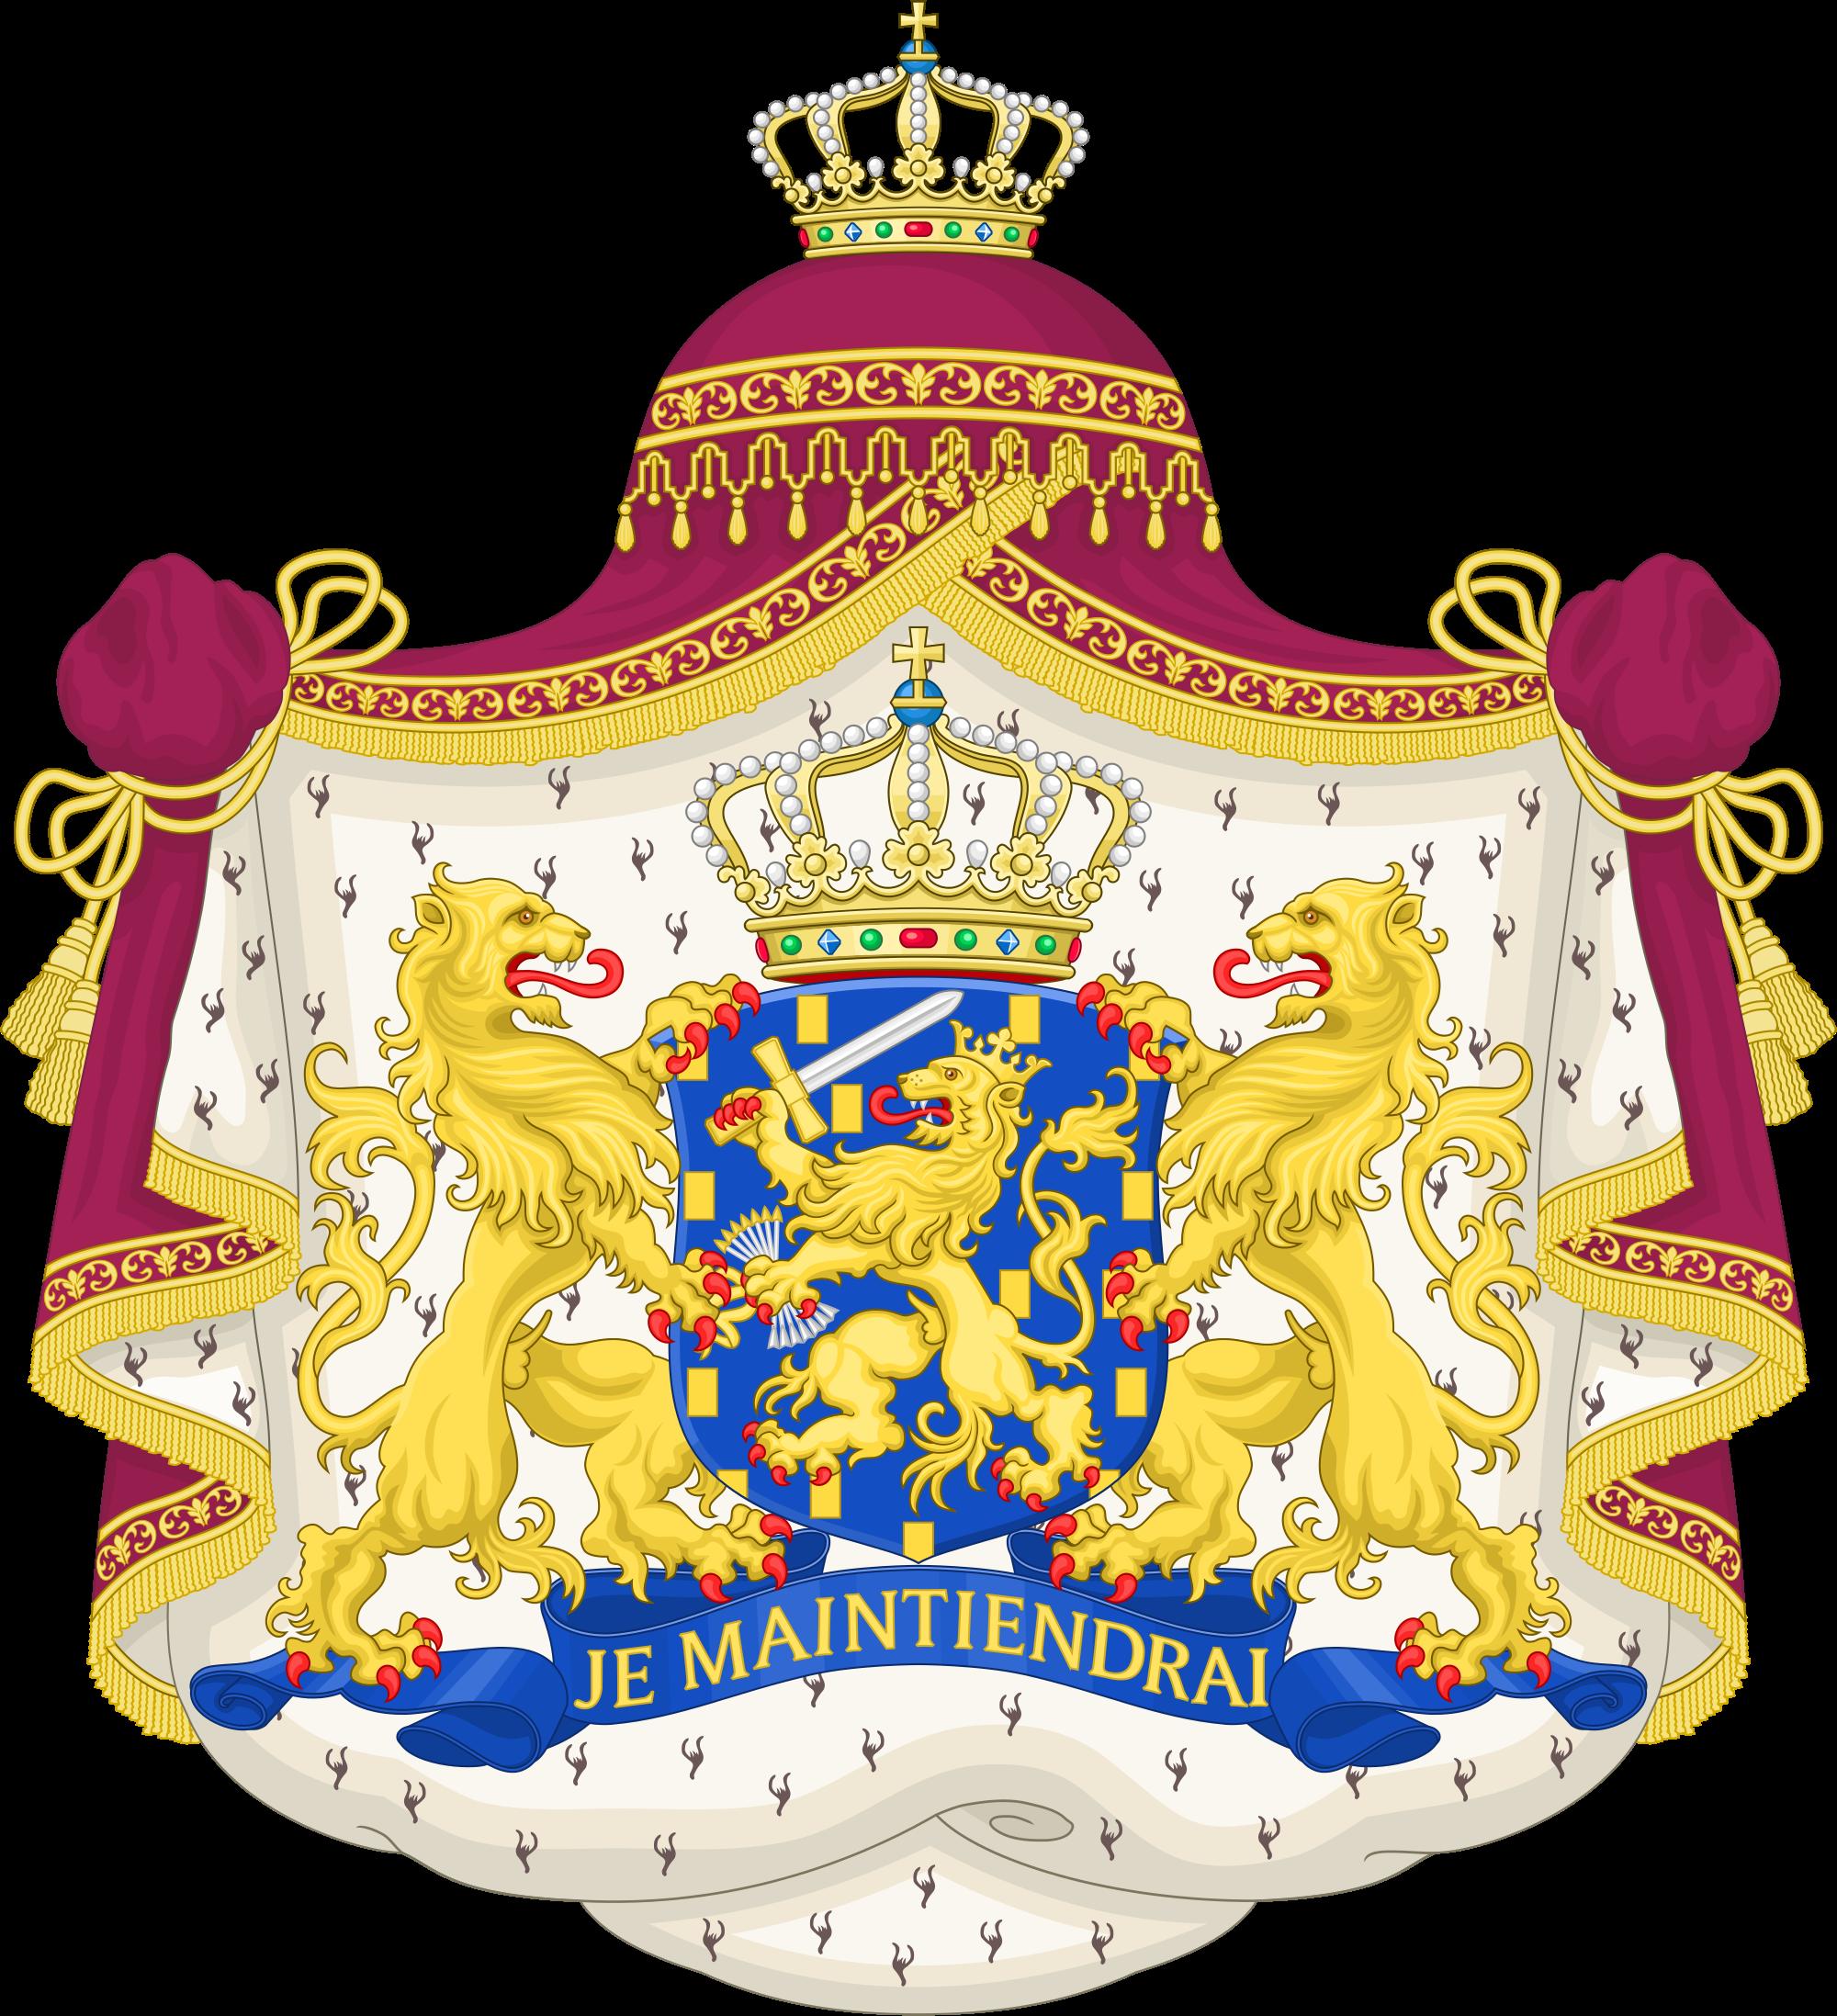 Países Bajos (ASXX)